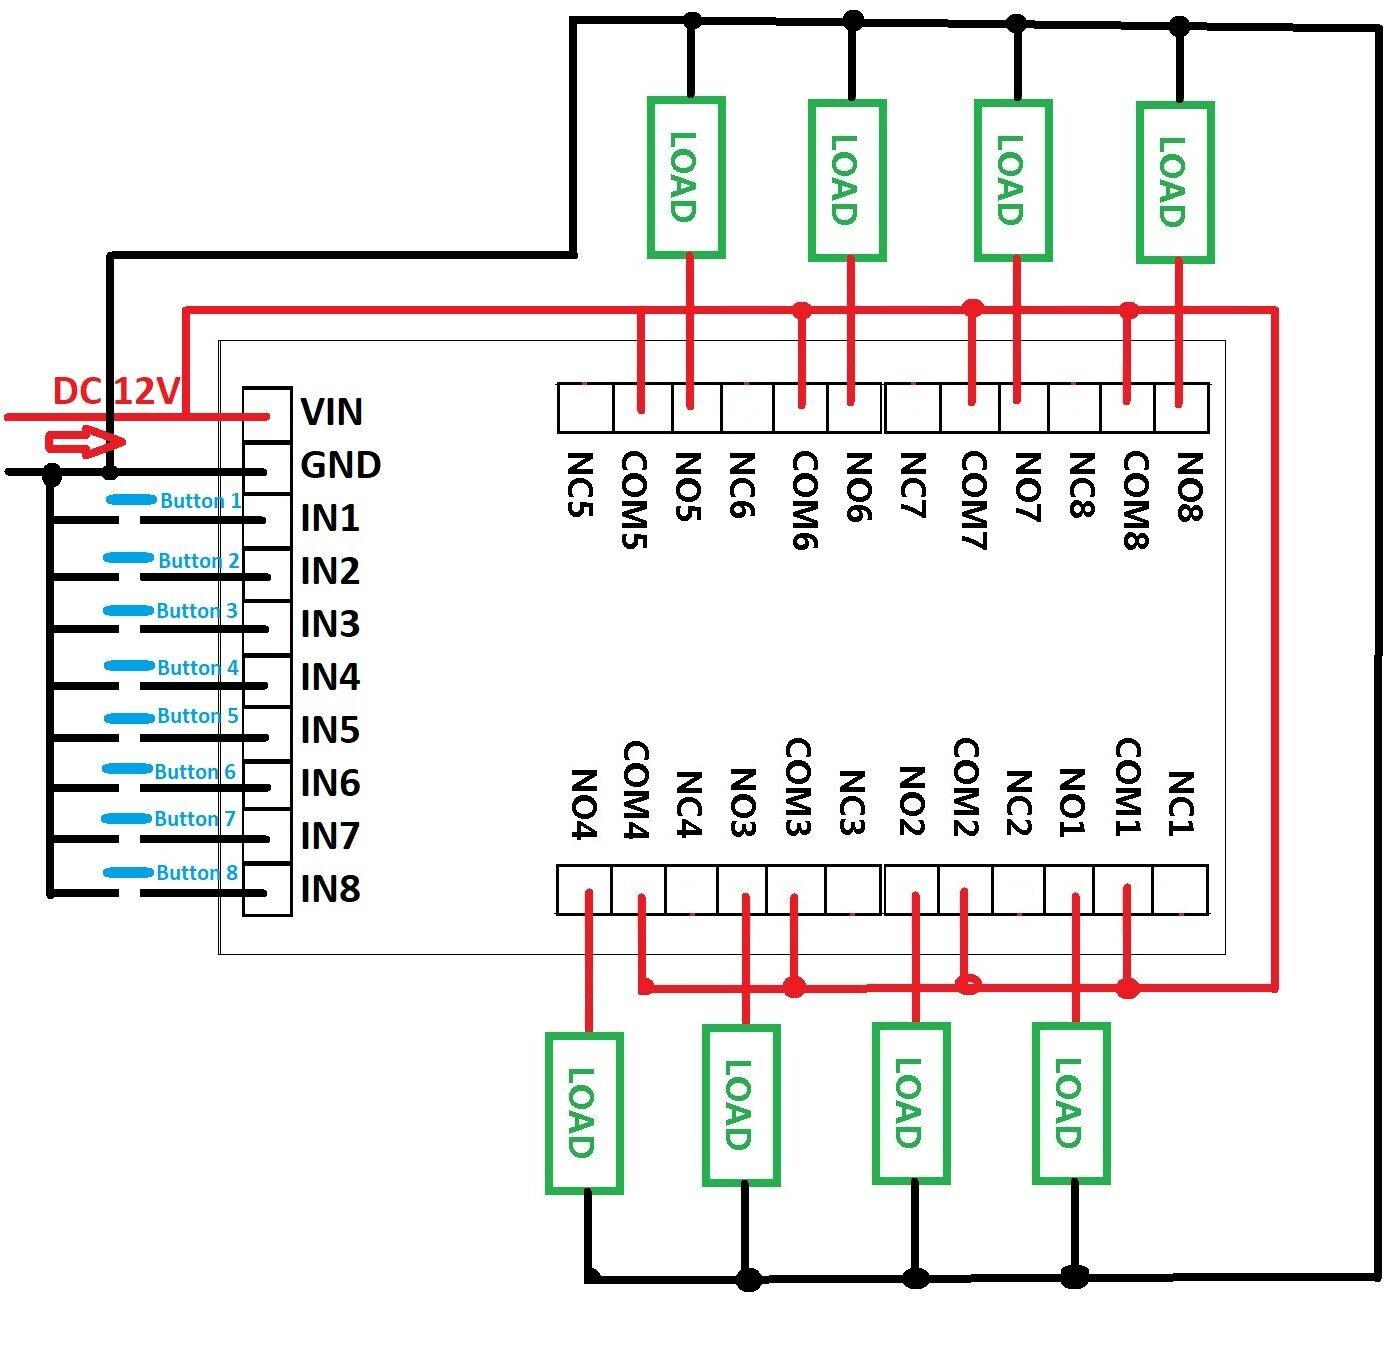 1pcs 12v Pro Mini Plc Board Relay Shield Module For